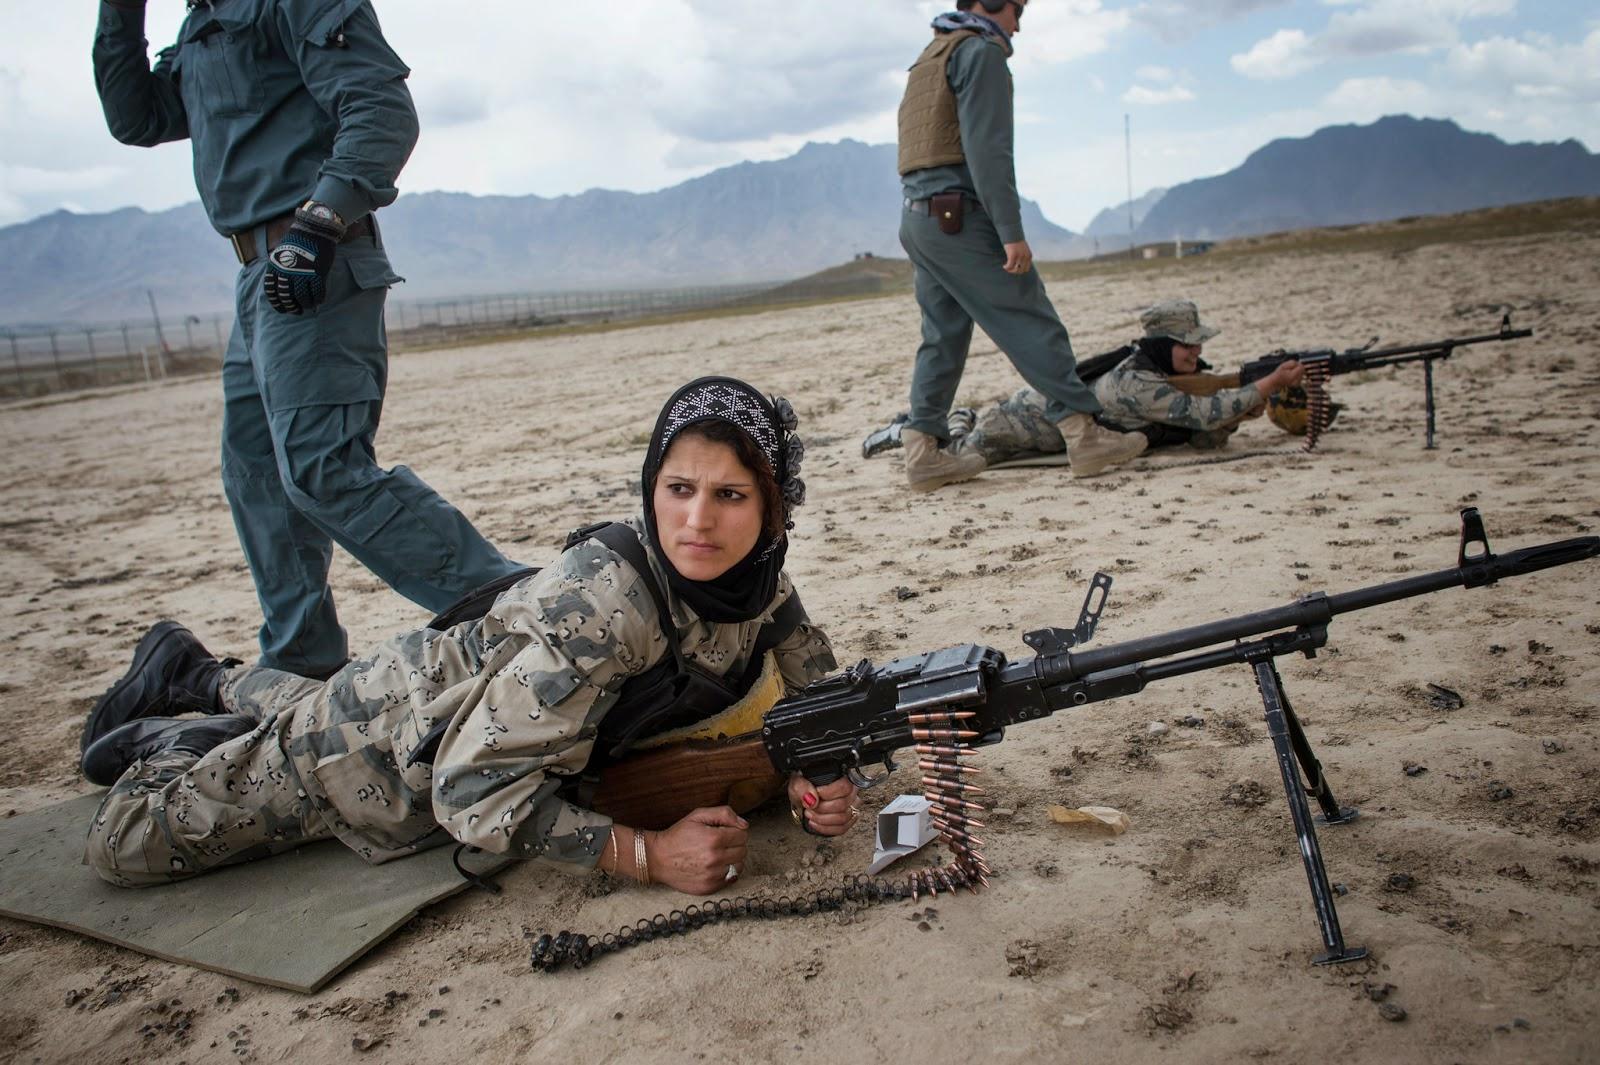 Mulheres na policía afegã lutam contra Cultura